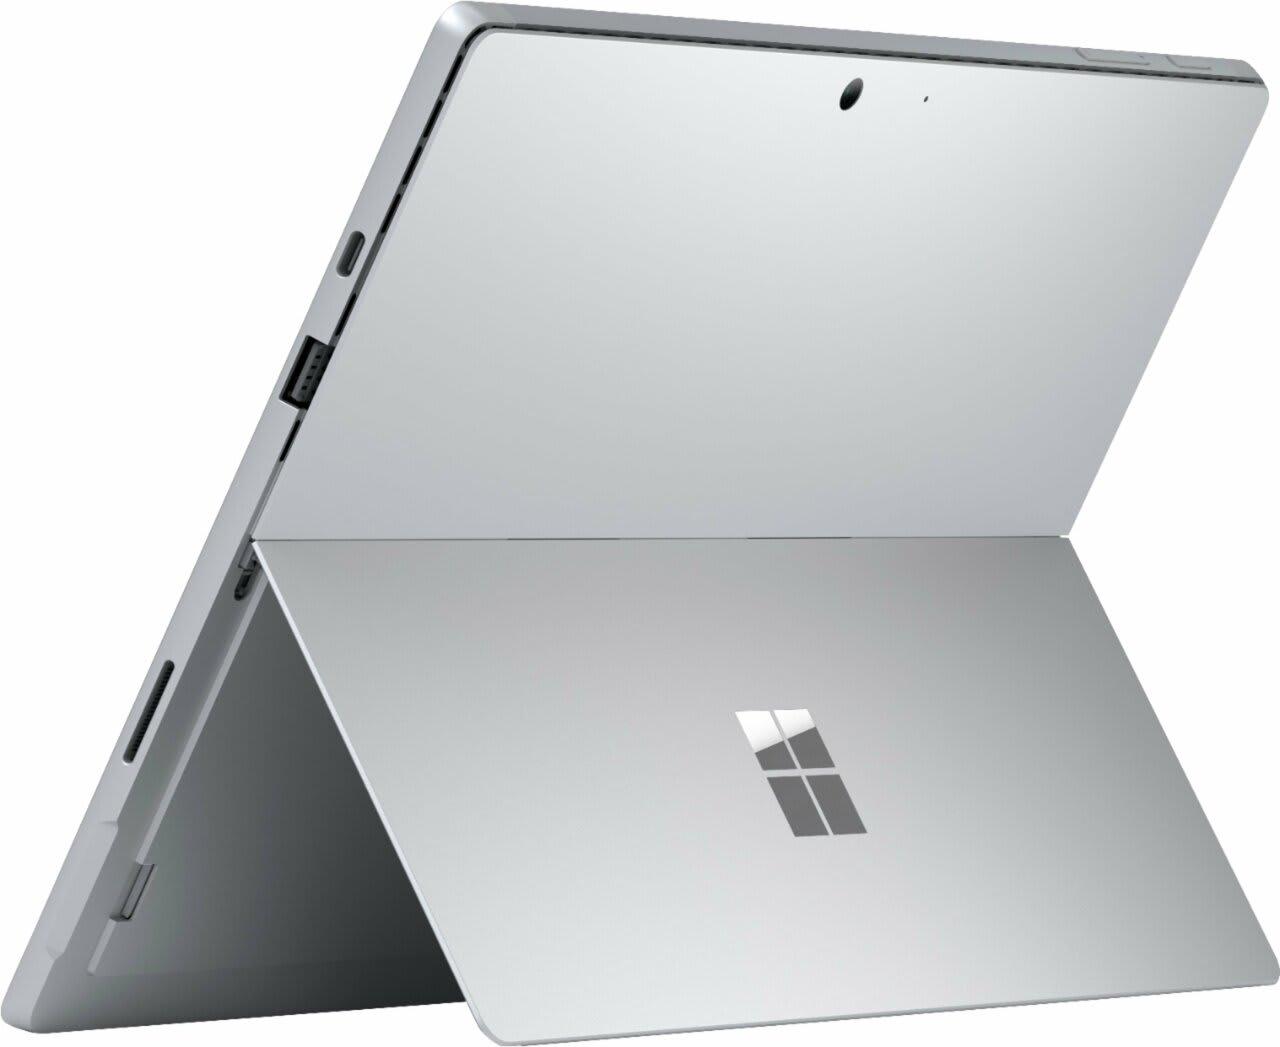 "Microsoft Surface Pro 3 i3 12"" Windows 10 Tablet"